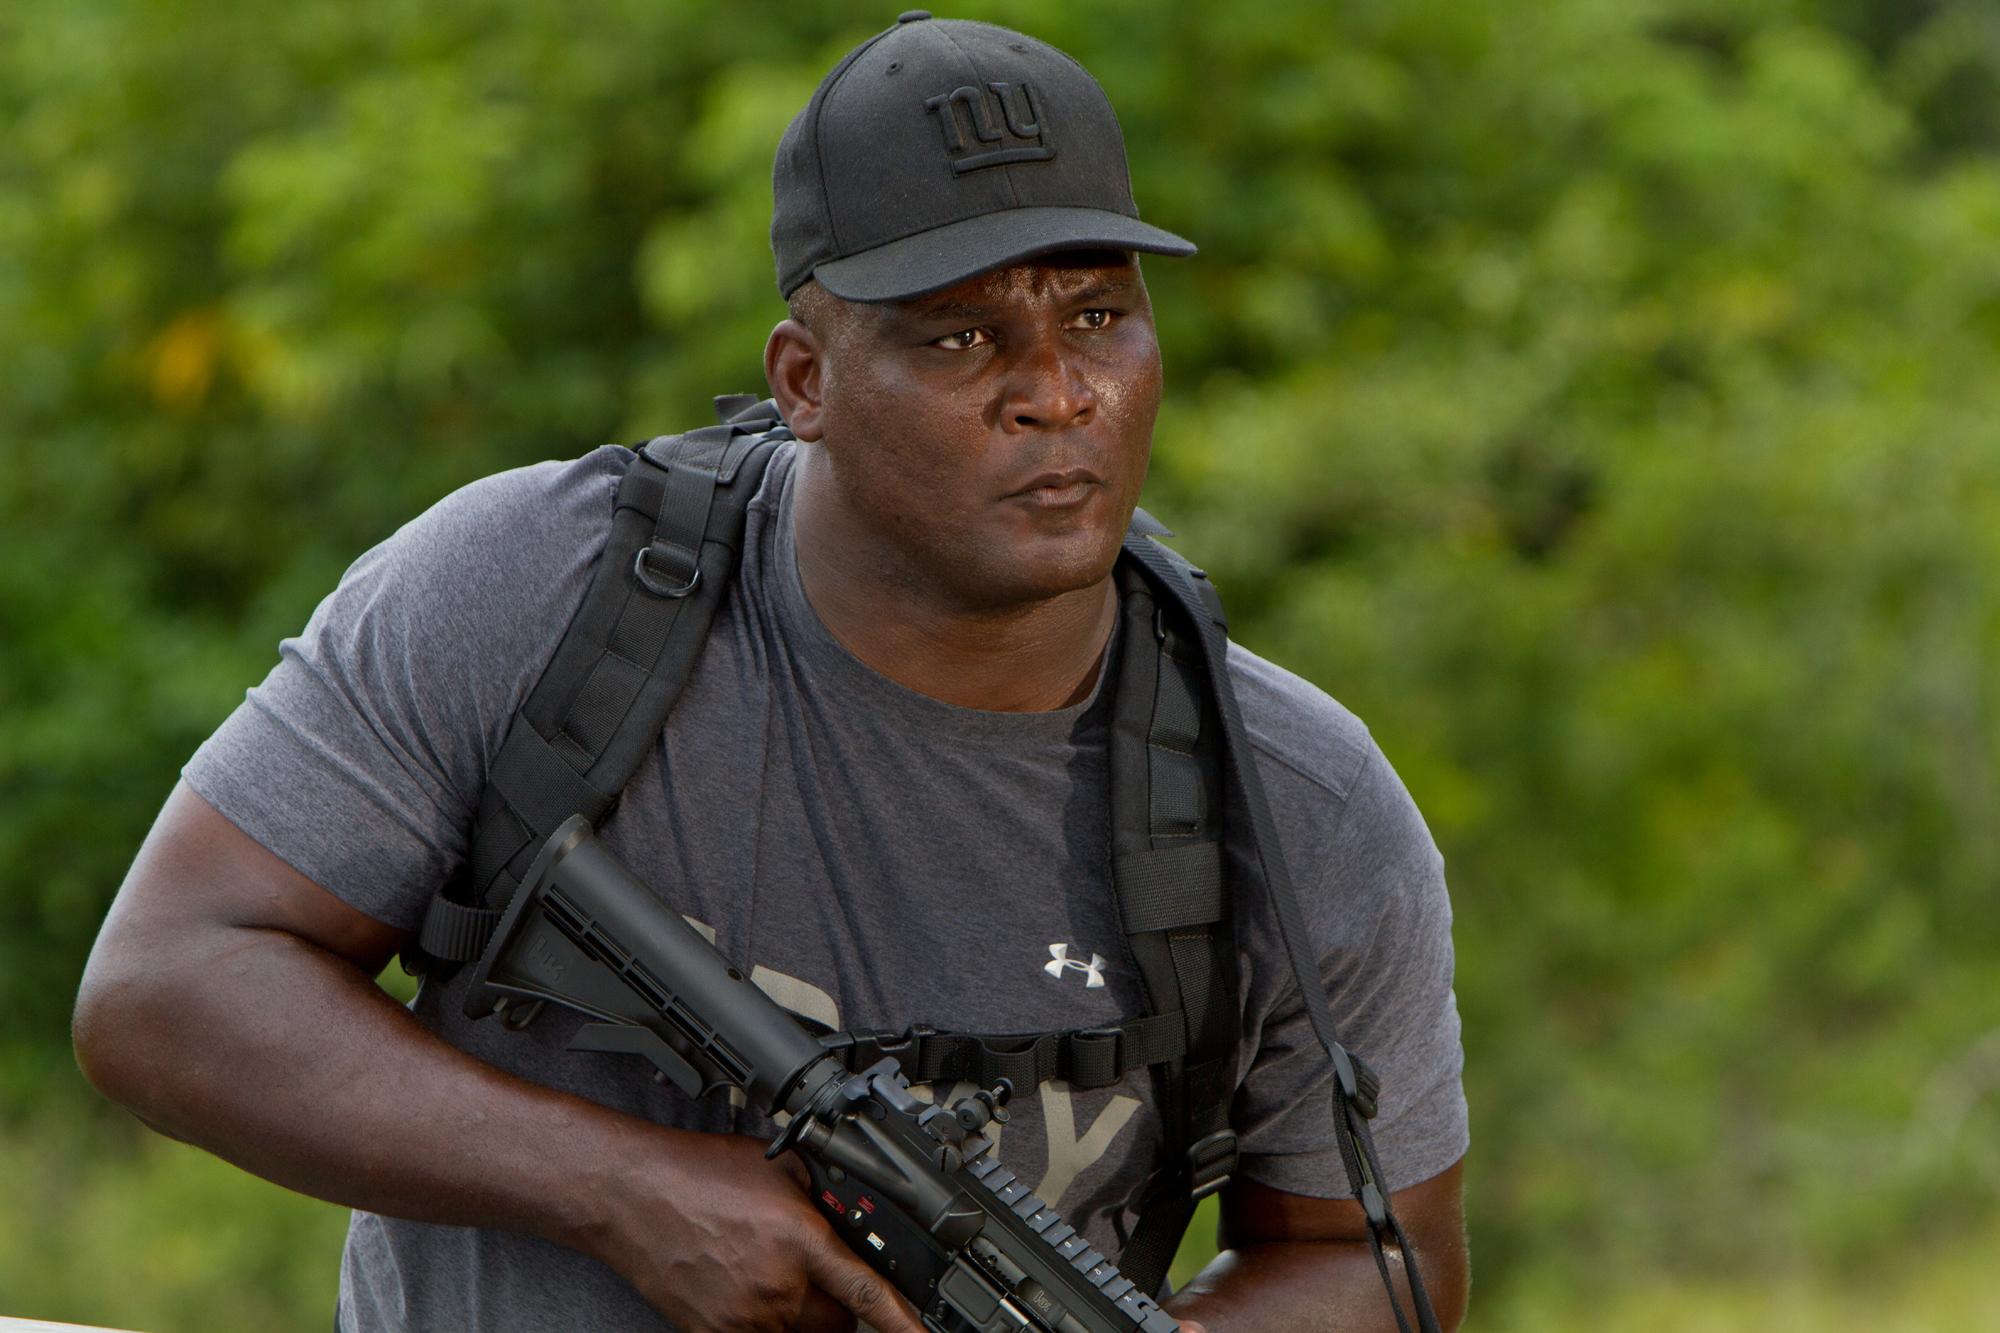 Black army guy